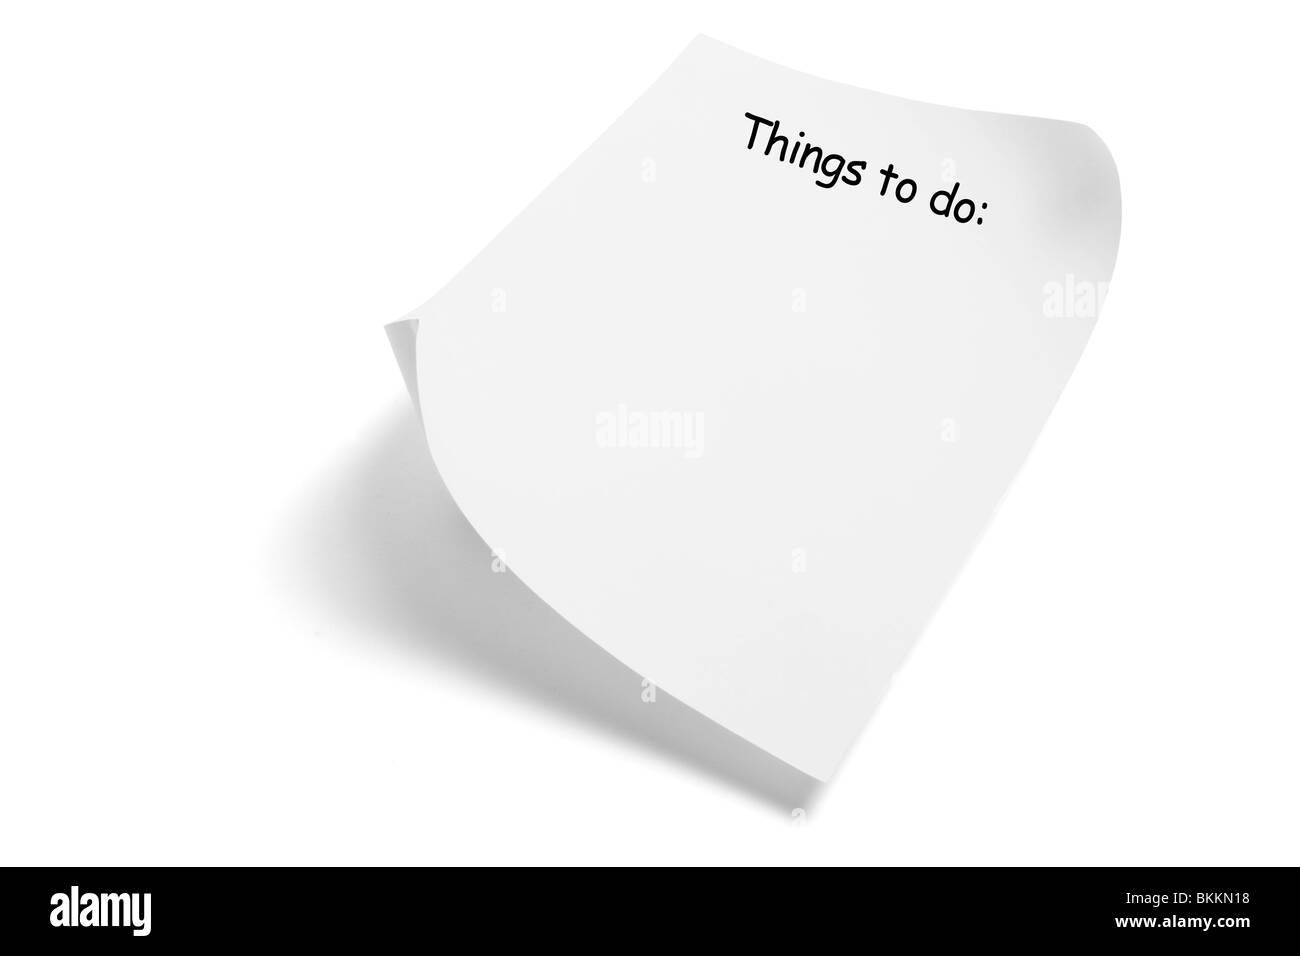 Things to Do Reminder - Stock Image